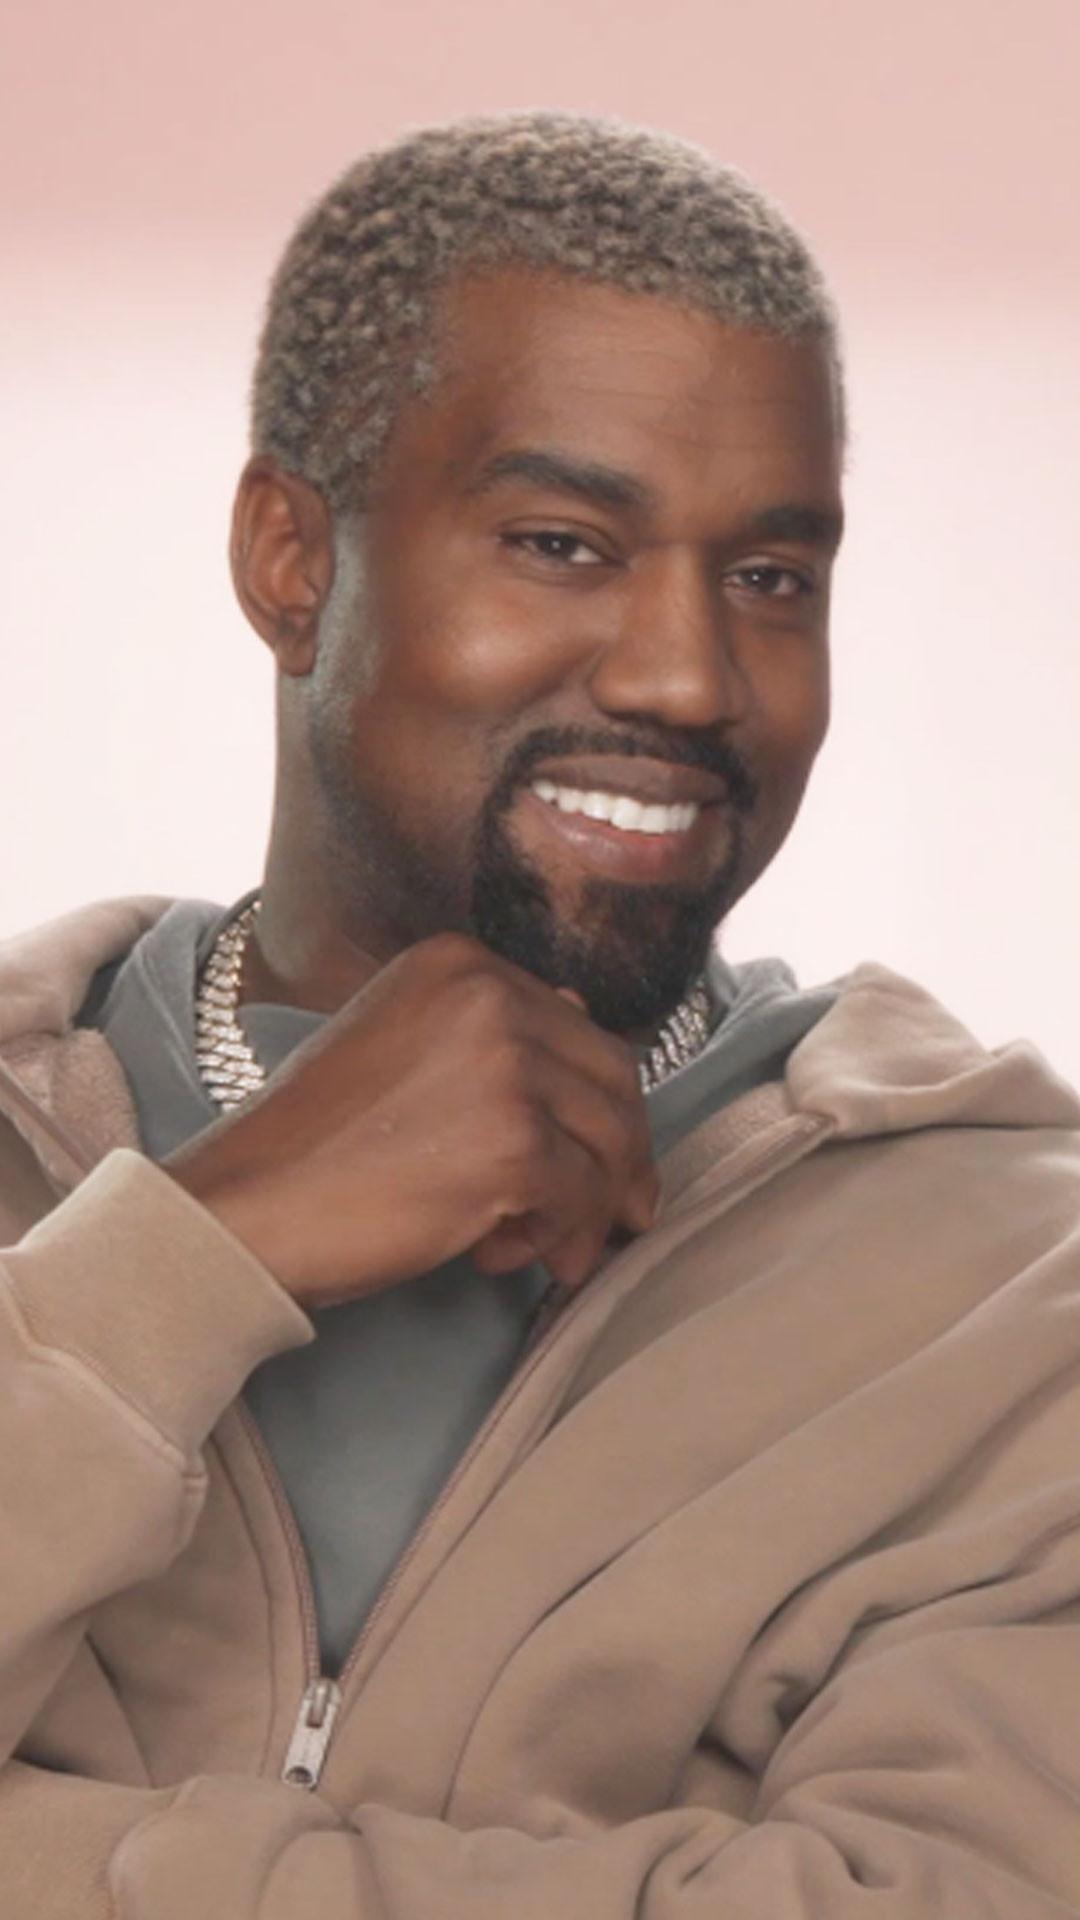 Kanye West, Kim Kardashian, KUWTK 1601